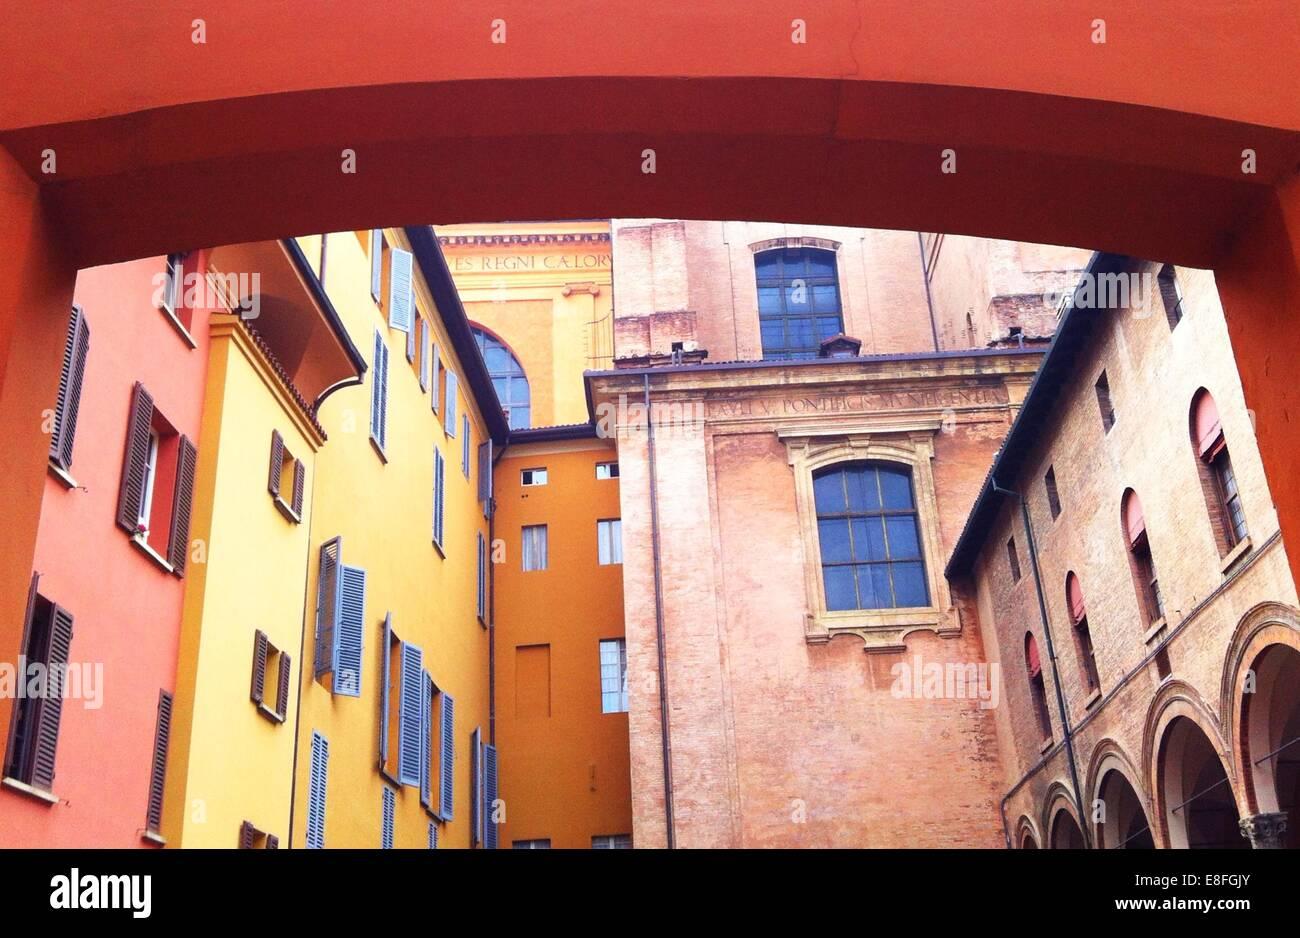 Multi-colored buildings, Bologna, Italy - Stock Image